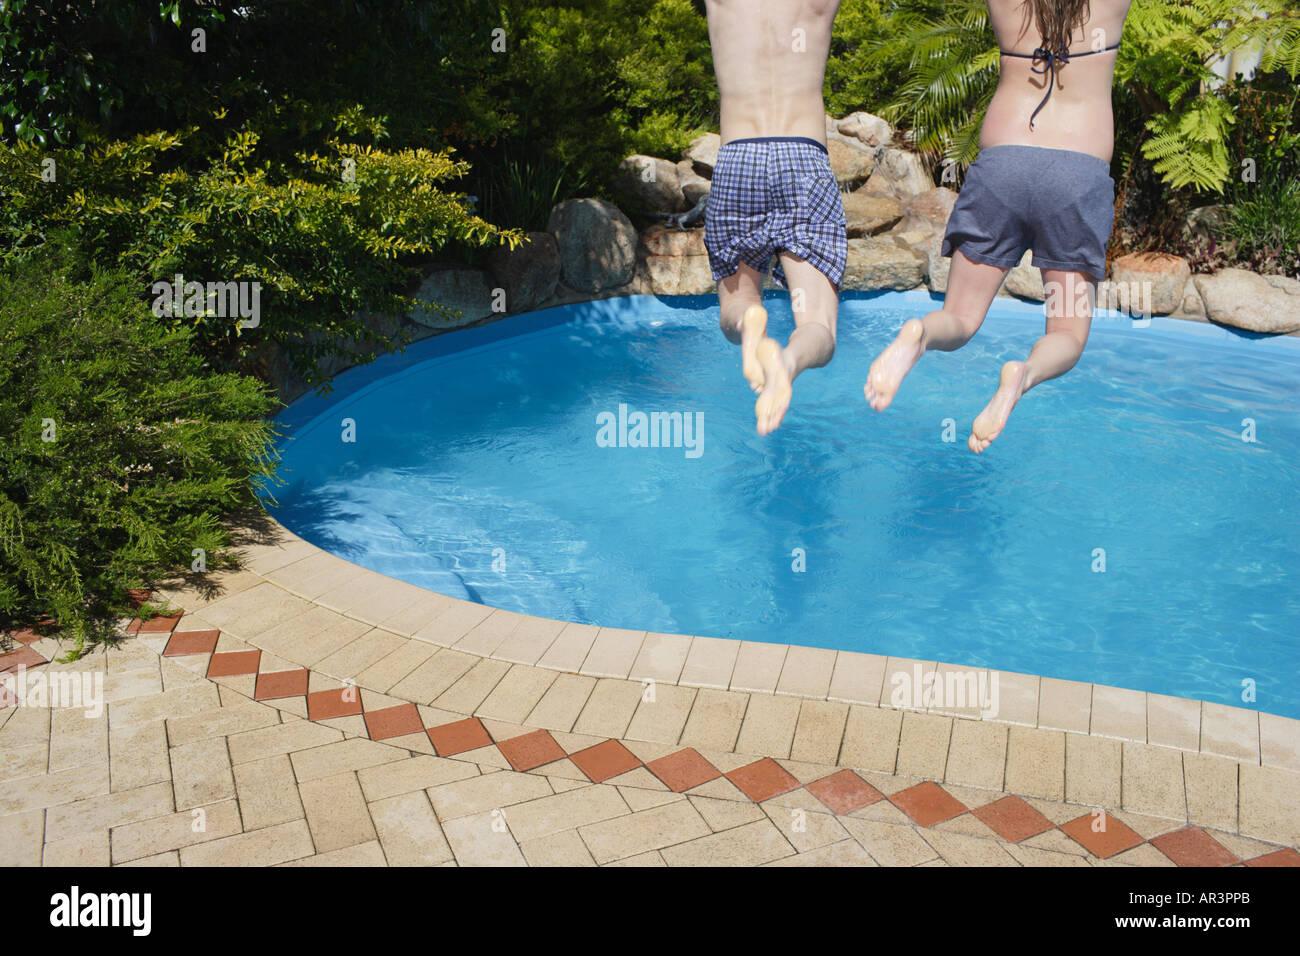 Junges Paar Sprung ins Freibad Stockbild